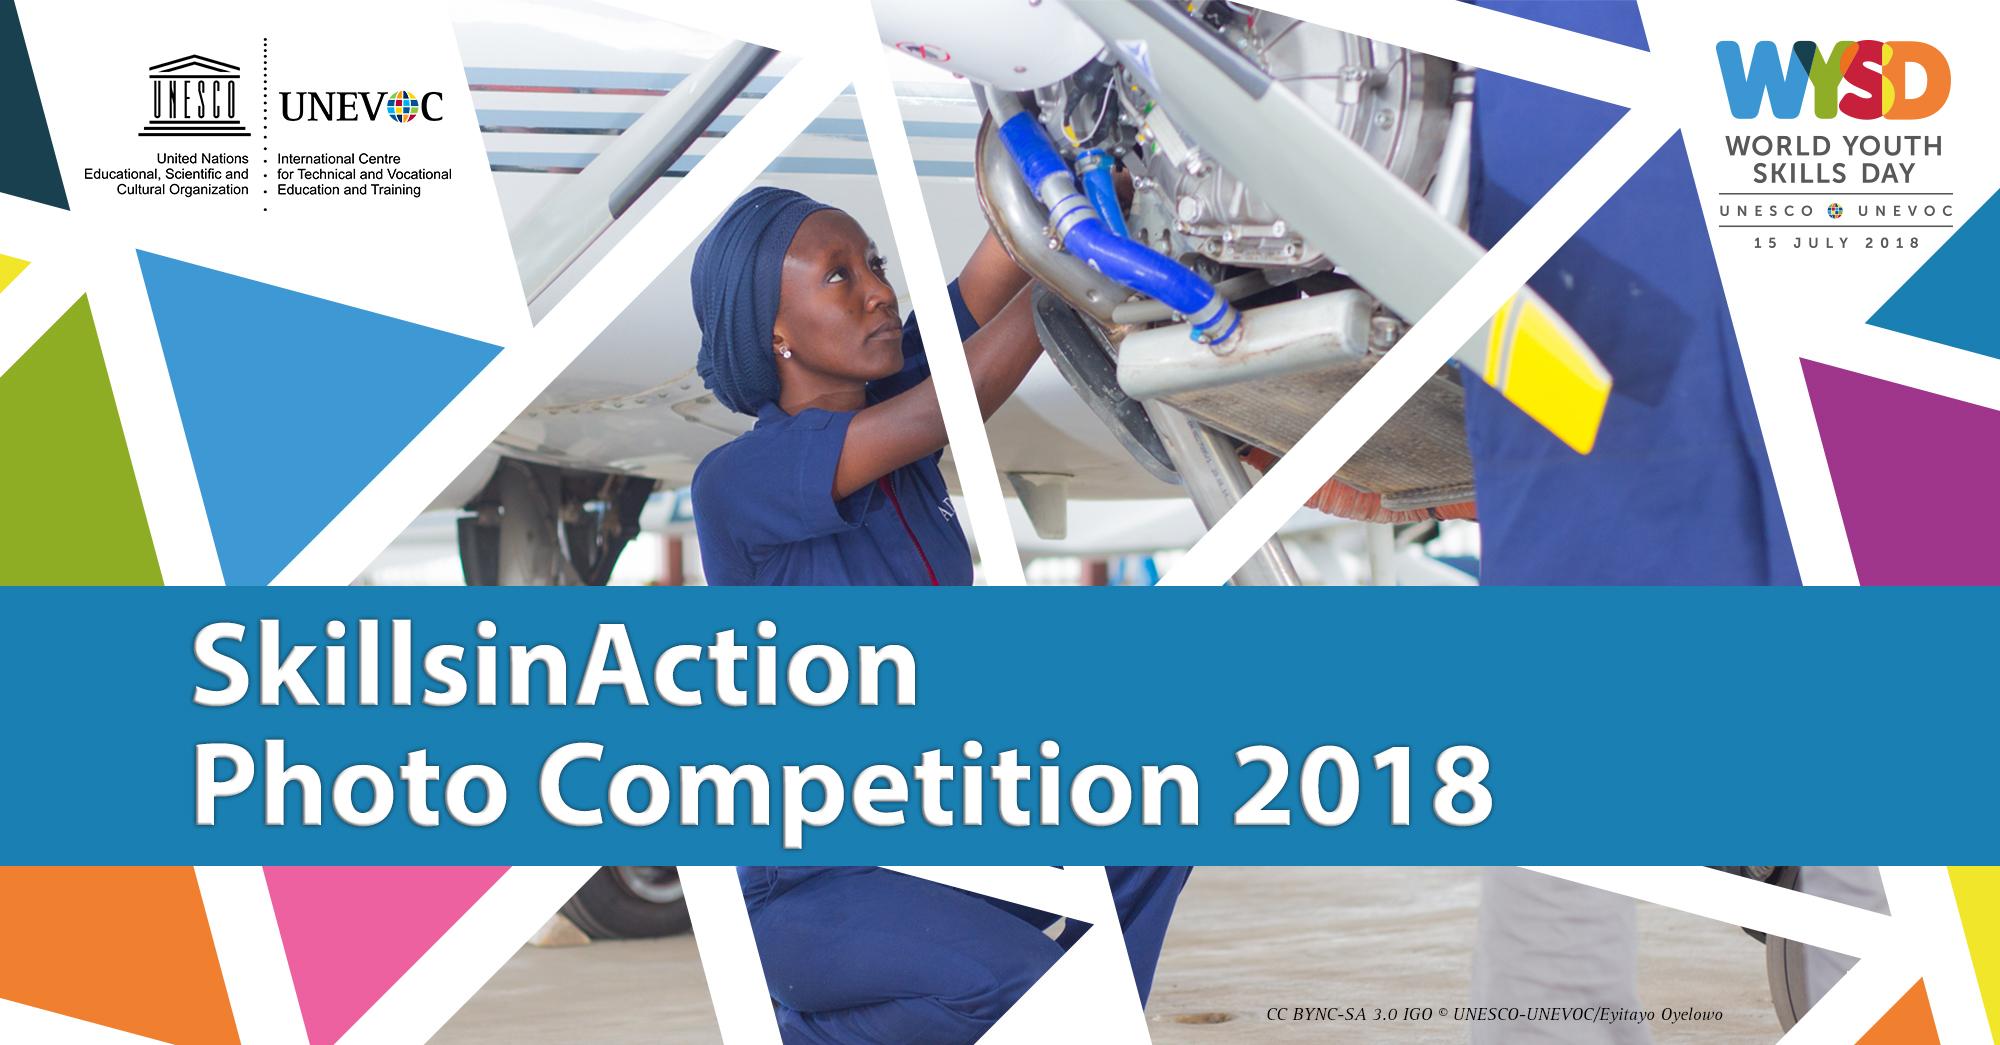 UNESCO-UNEVOC SkillsinAction Photo Competition - logo